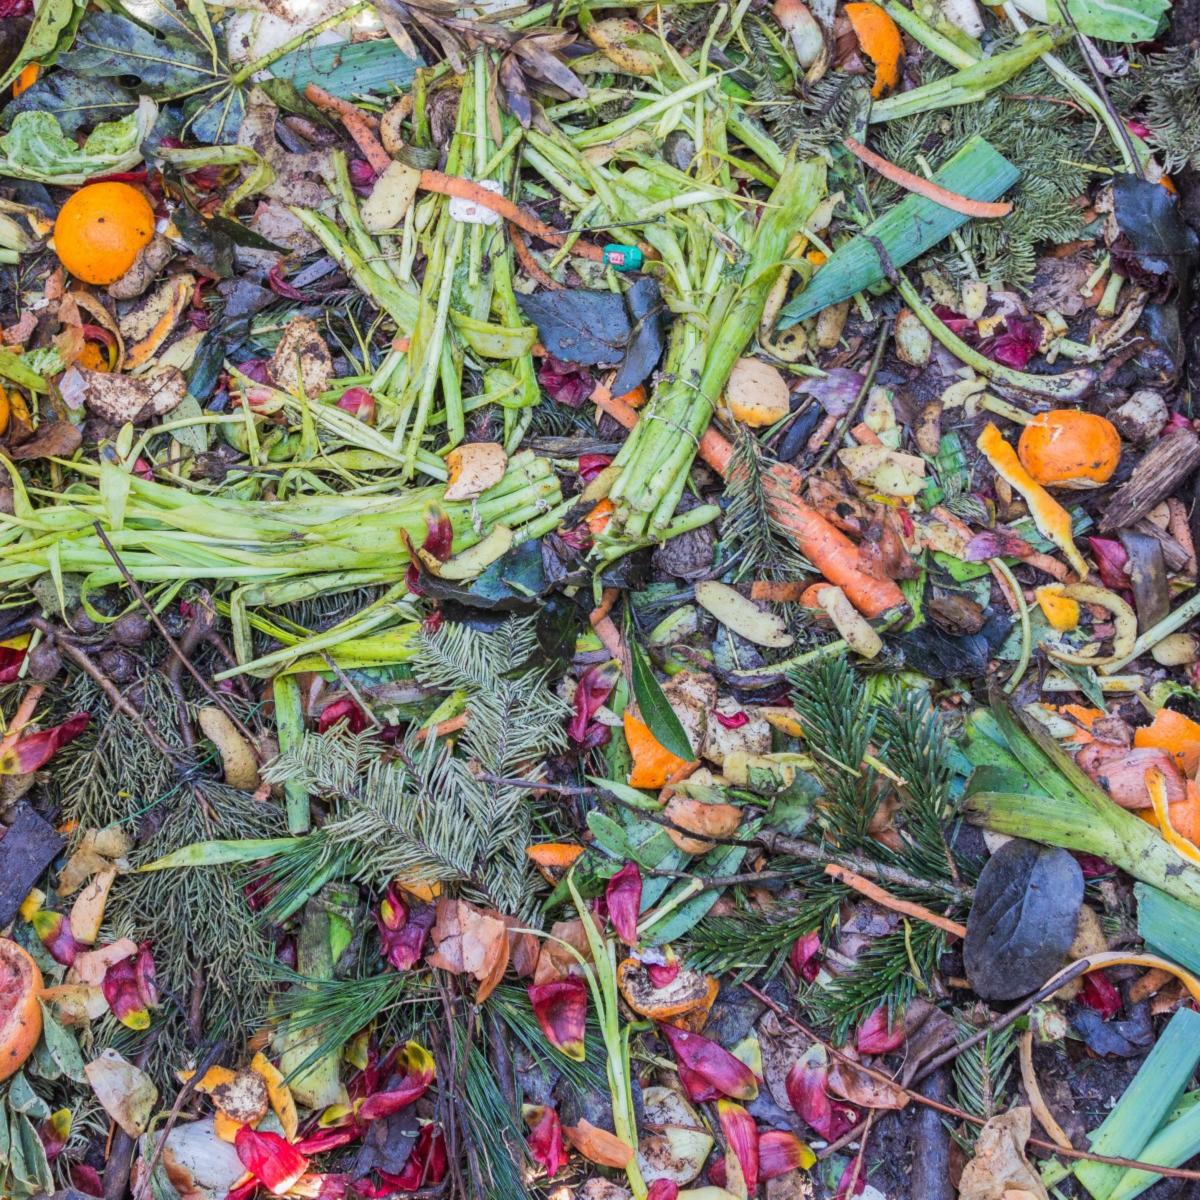 Stink-Free Composting